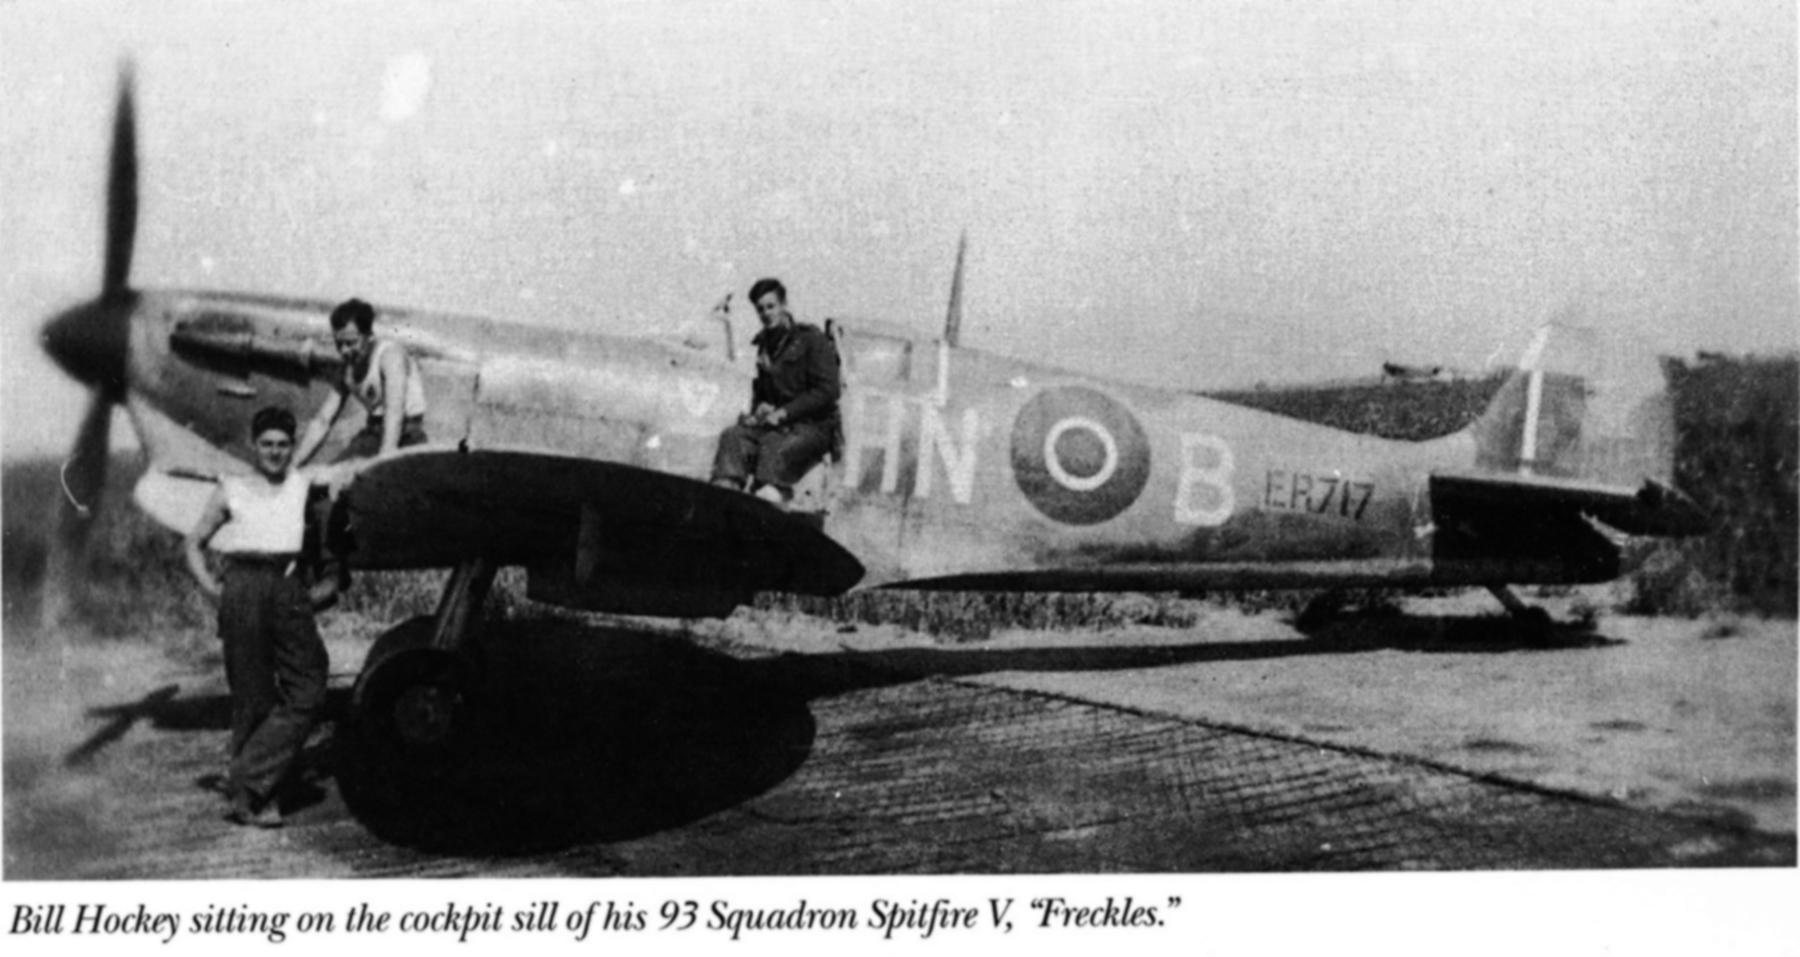 Spitfire MkVbTrop RAF 93Sqn HNB Bill Hockey ER717 North Africa 1943 01